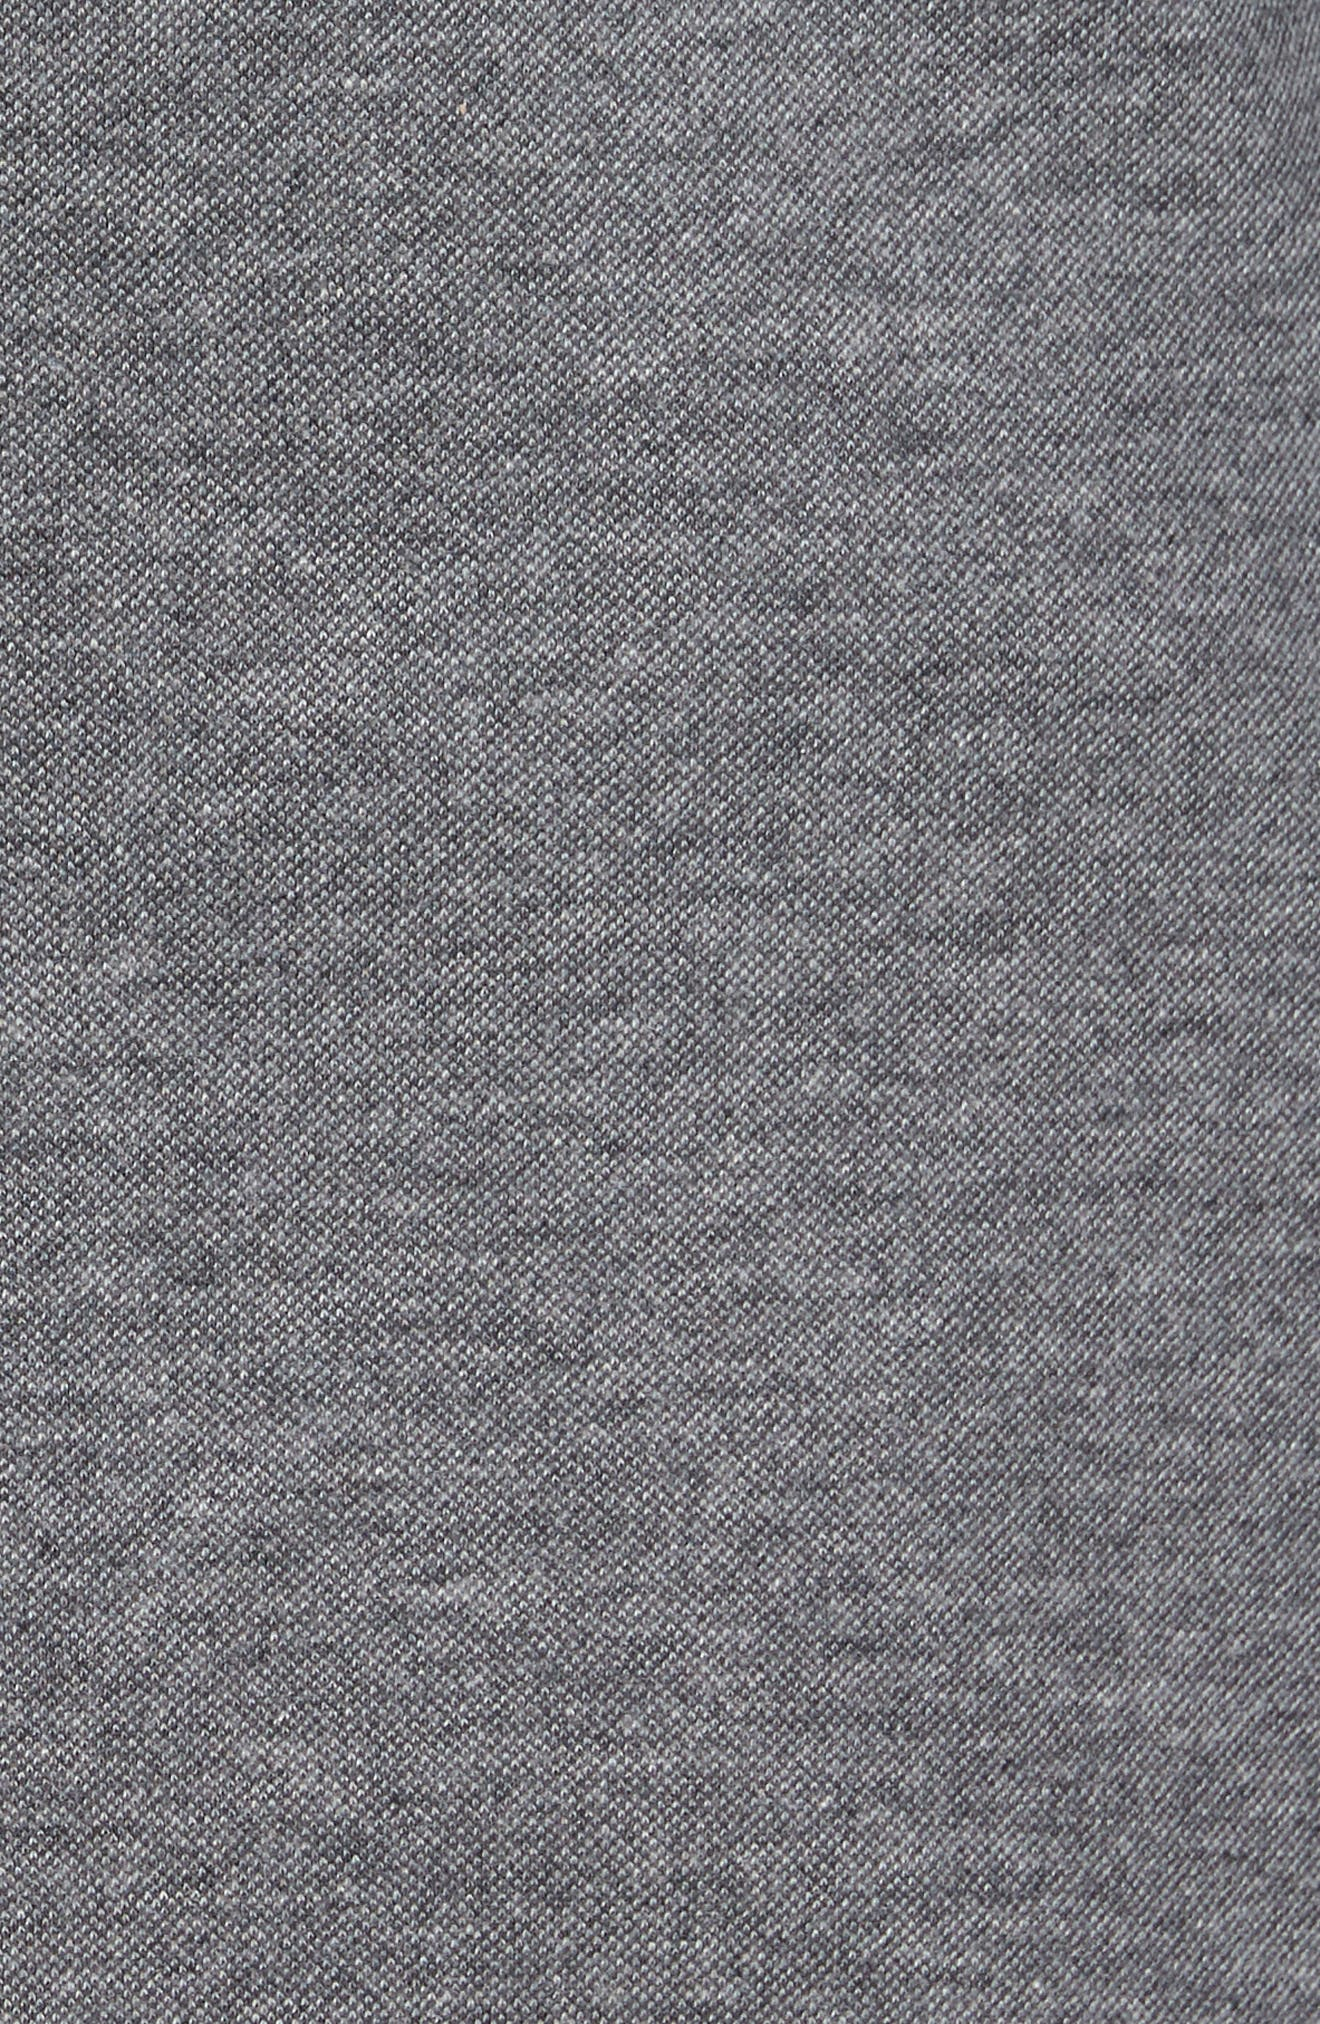 Alternate Image 5  - Peter Millar Sierran Jersey Knit Jacket